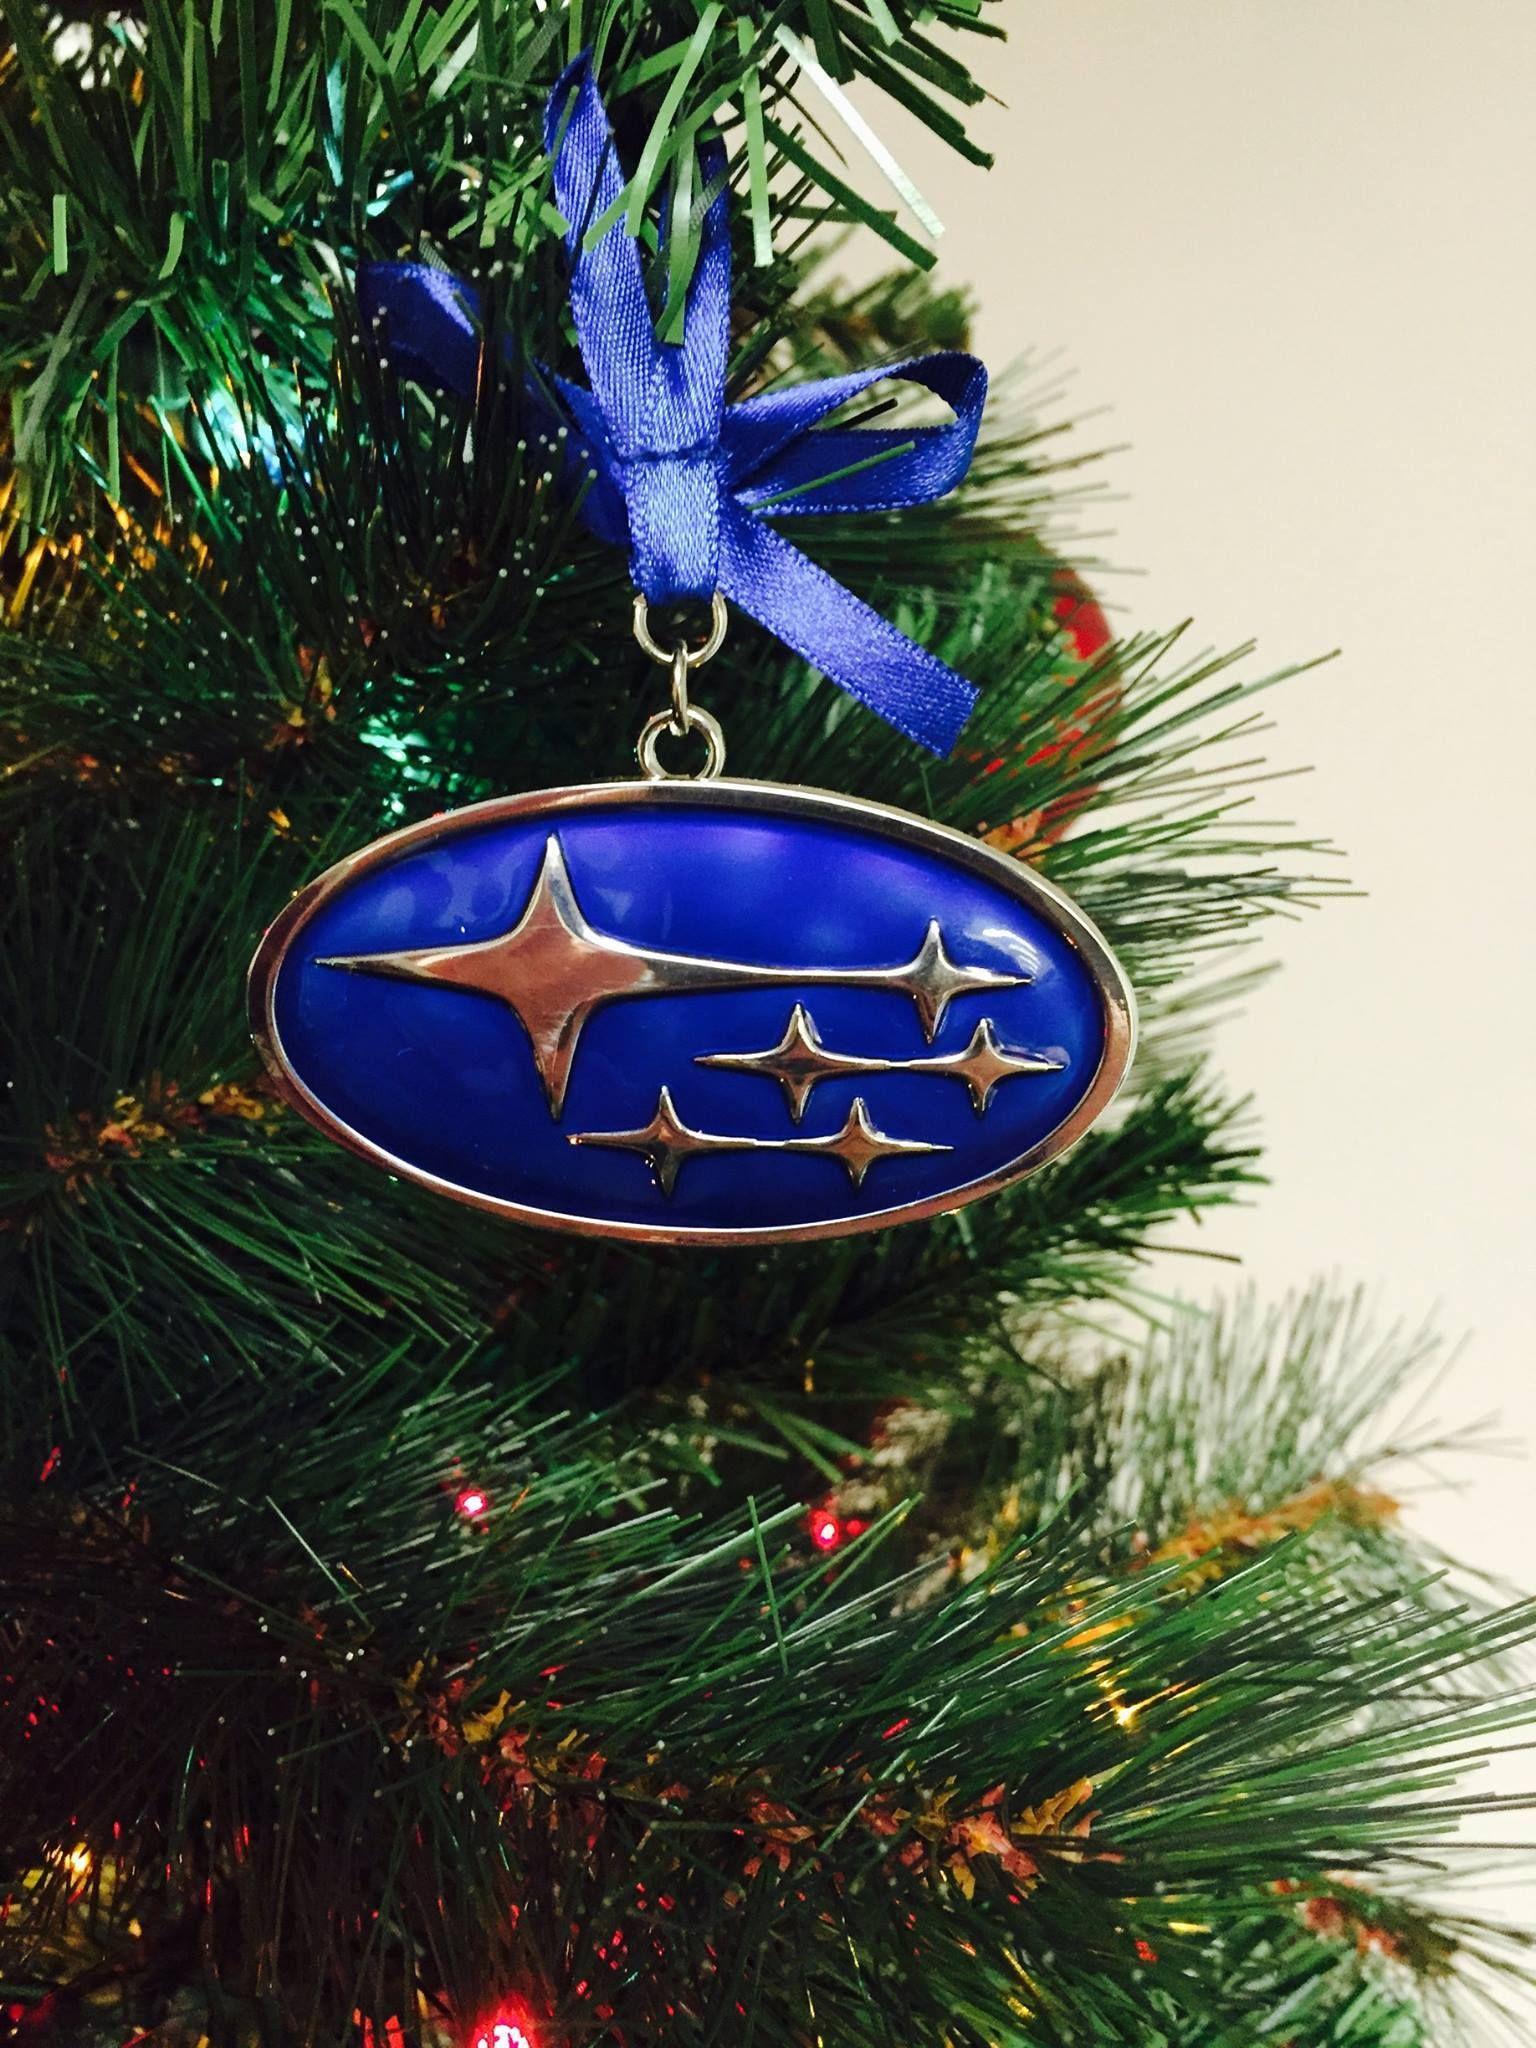 From Our Family To Yours Happy Holidays And Happy Wrxmas Subaru Subaru Cars Wrx